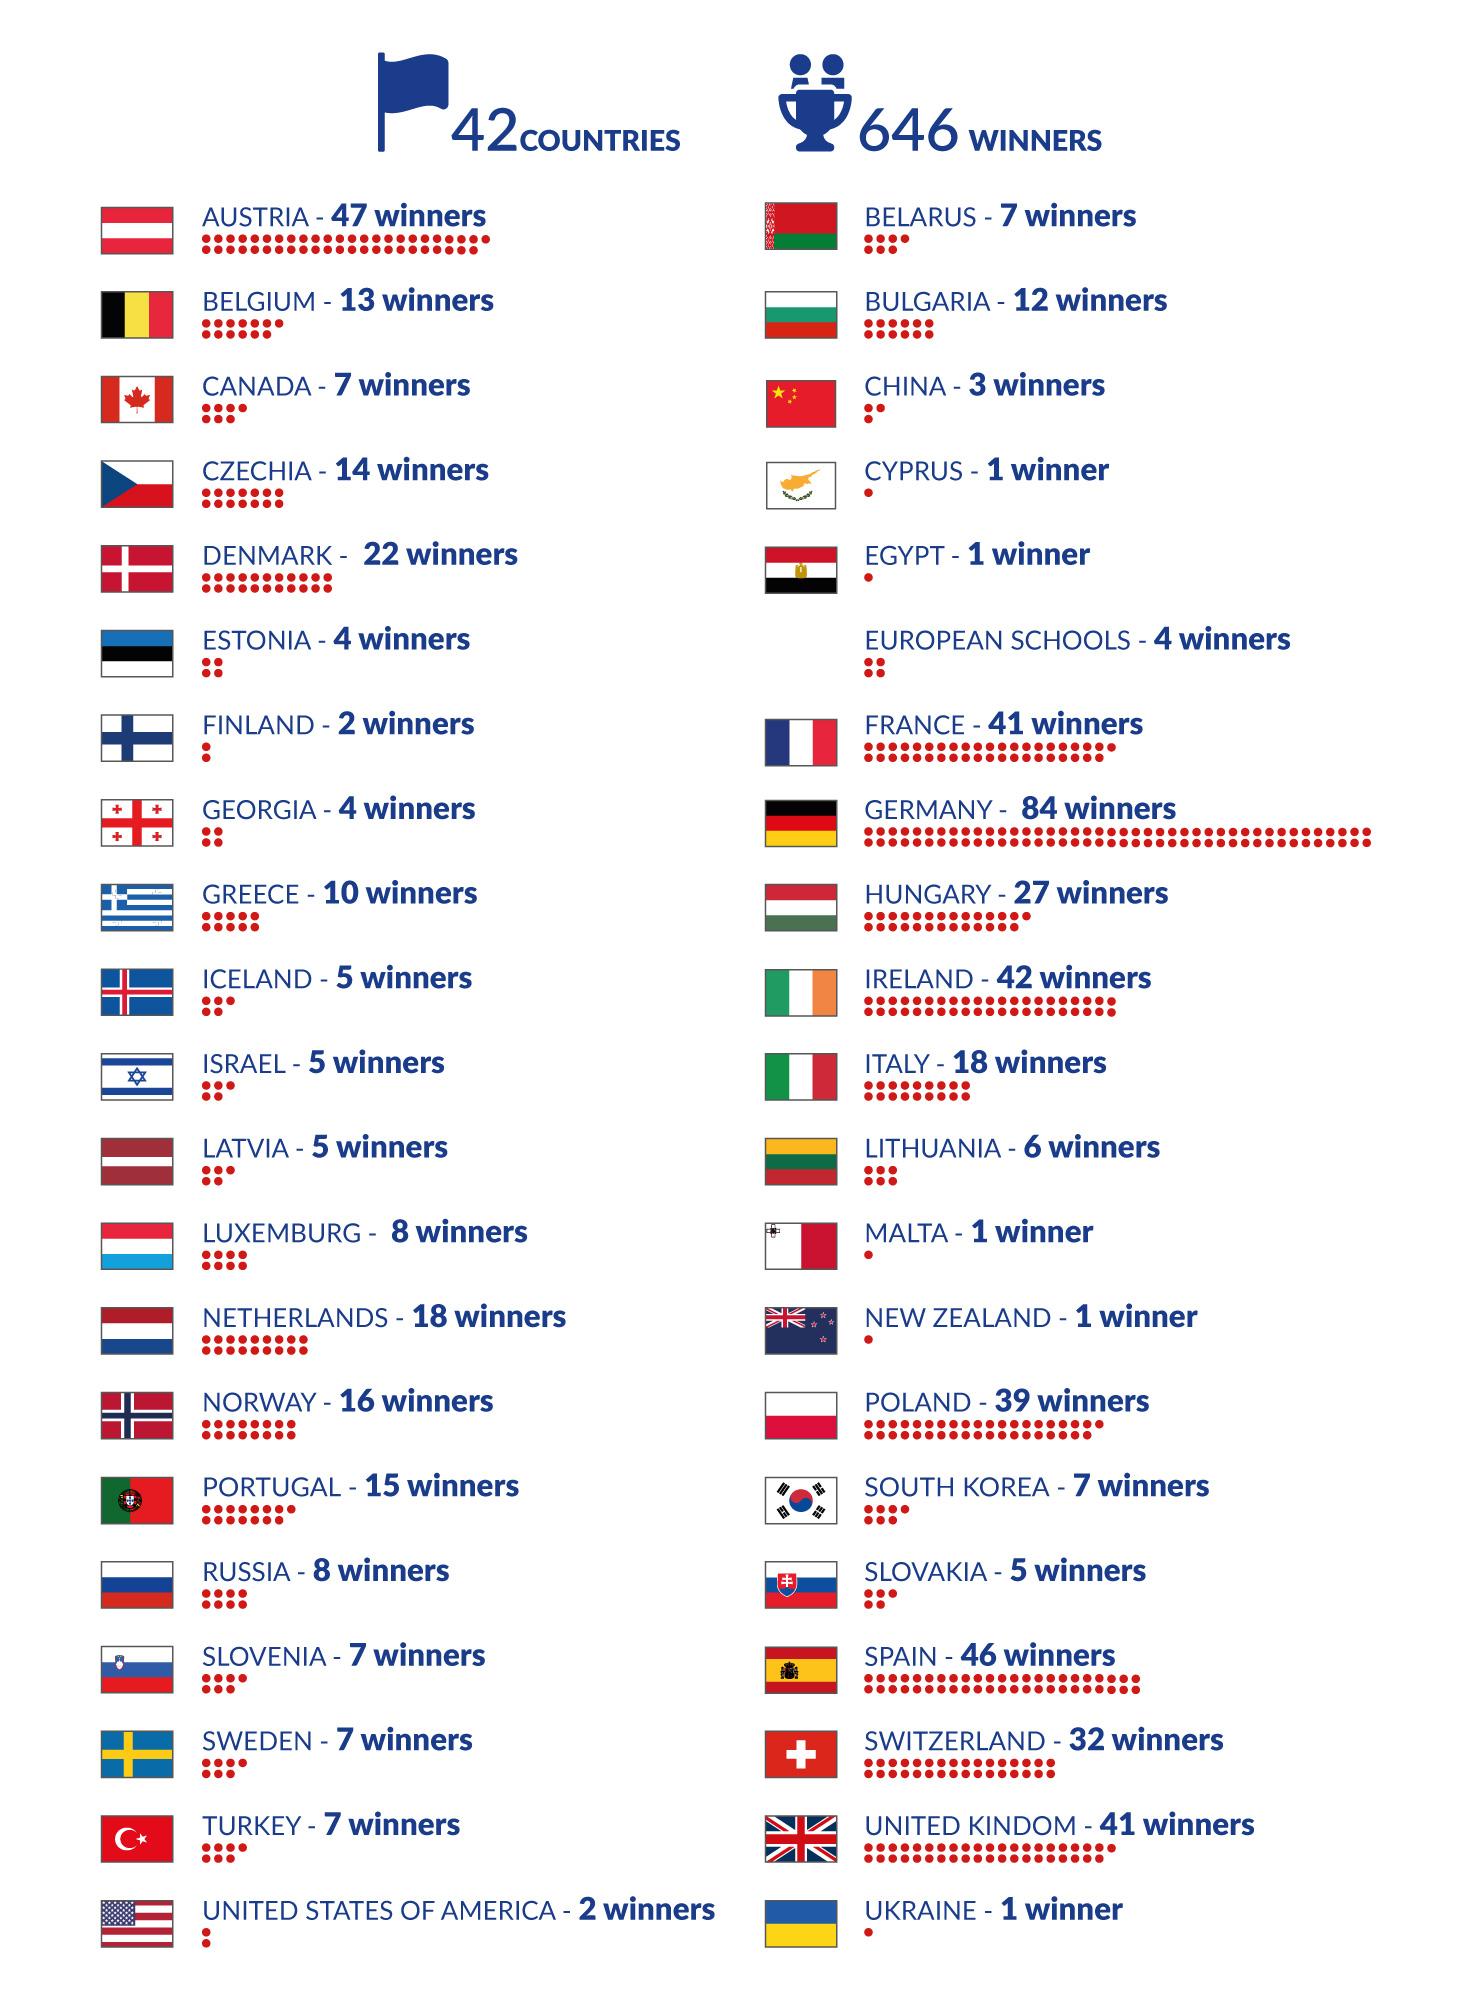 Ganadores de EUCYS 1989-2019 por países